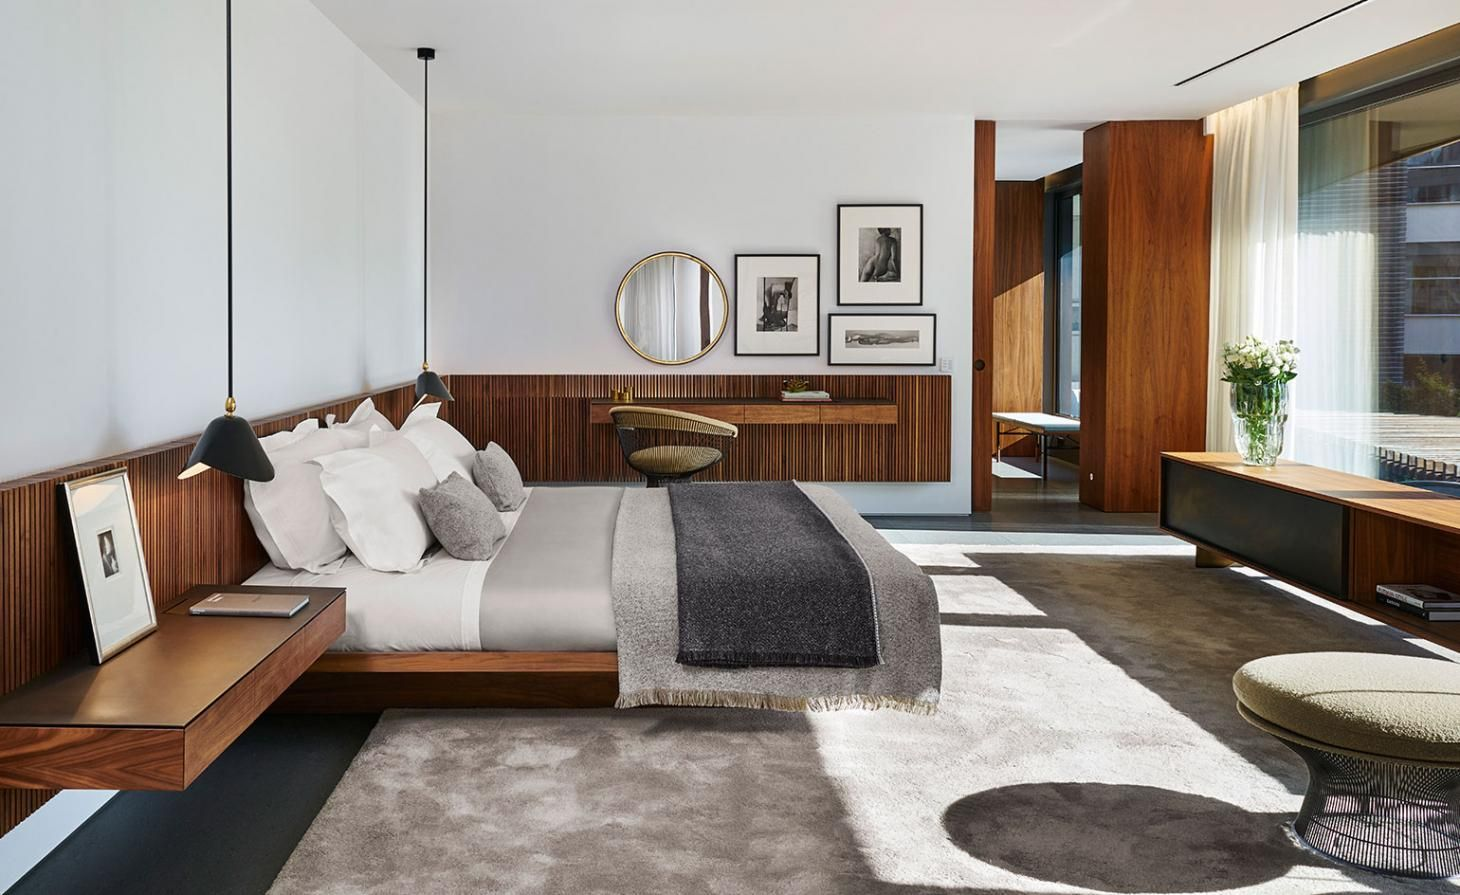 Best Marcio Kogan Makes His Mark On Barcelona With Francesc Macià 10 Apartment Design Luxury 400 x 300